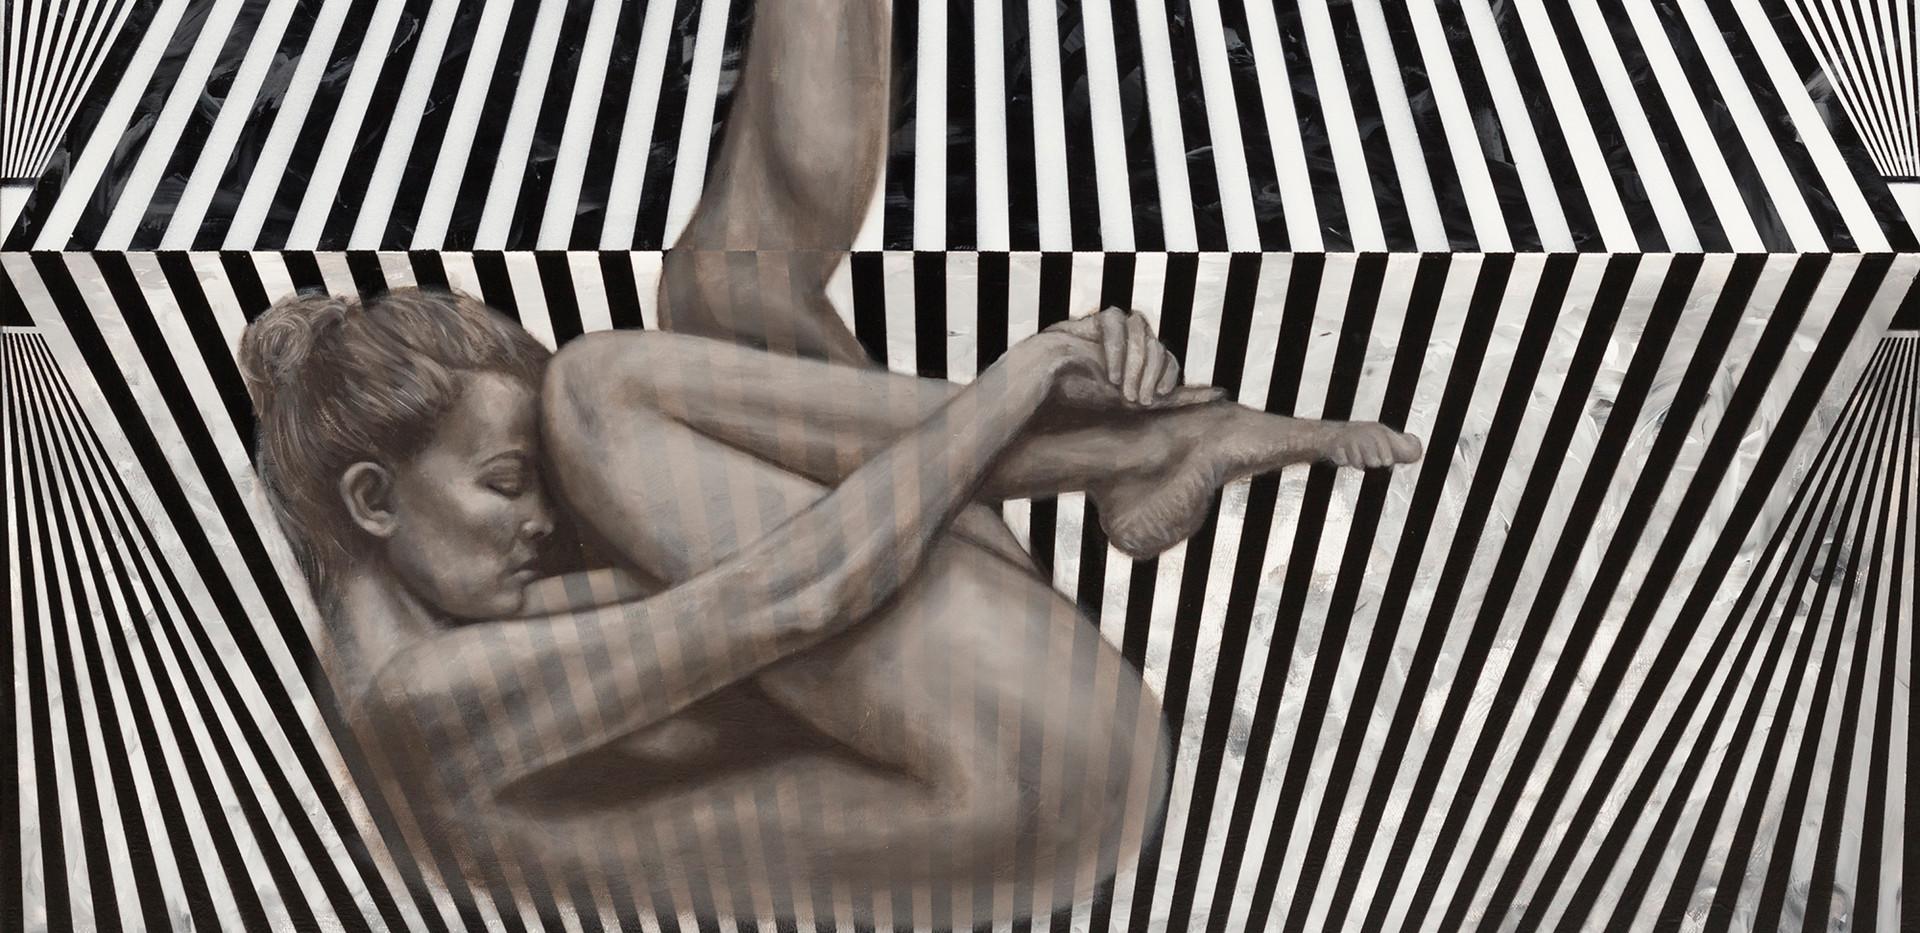 Jessica Feldman, Believe, oil on canvas, 80 x 80 cm, 2018